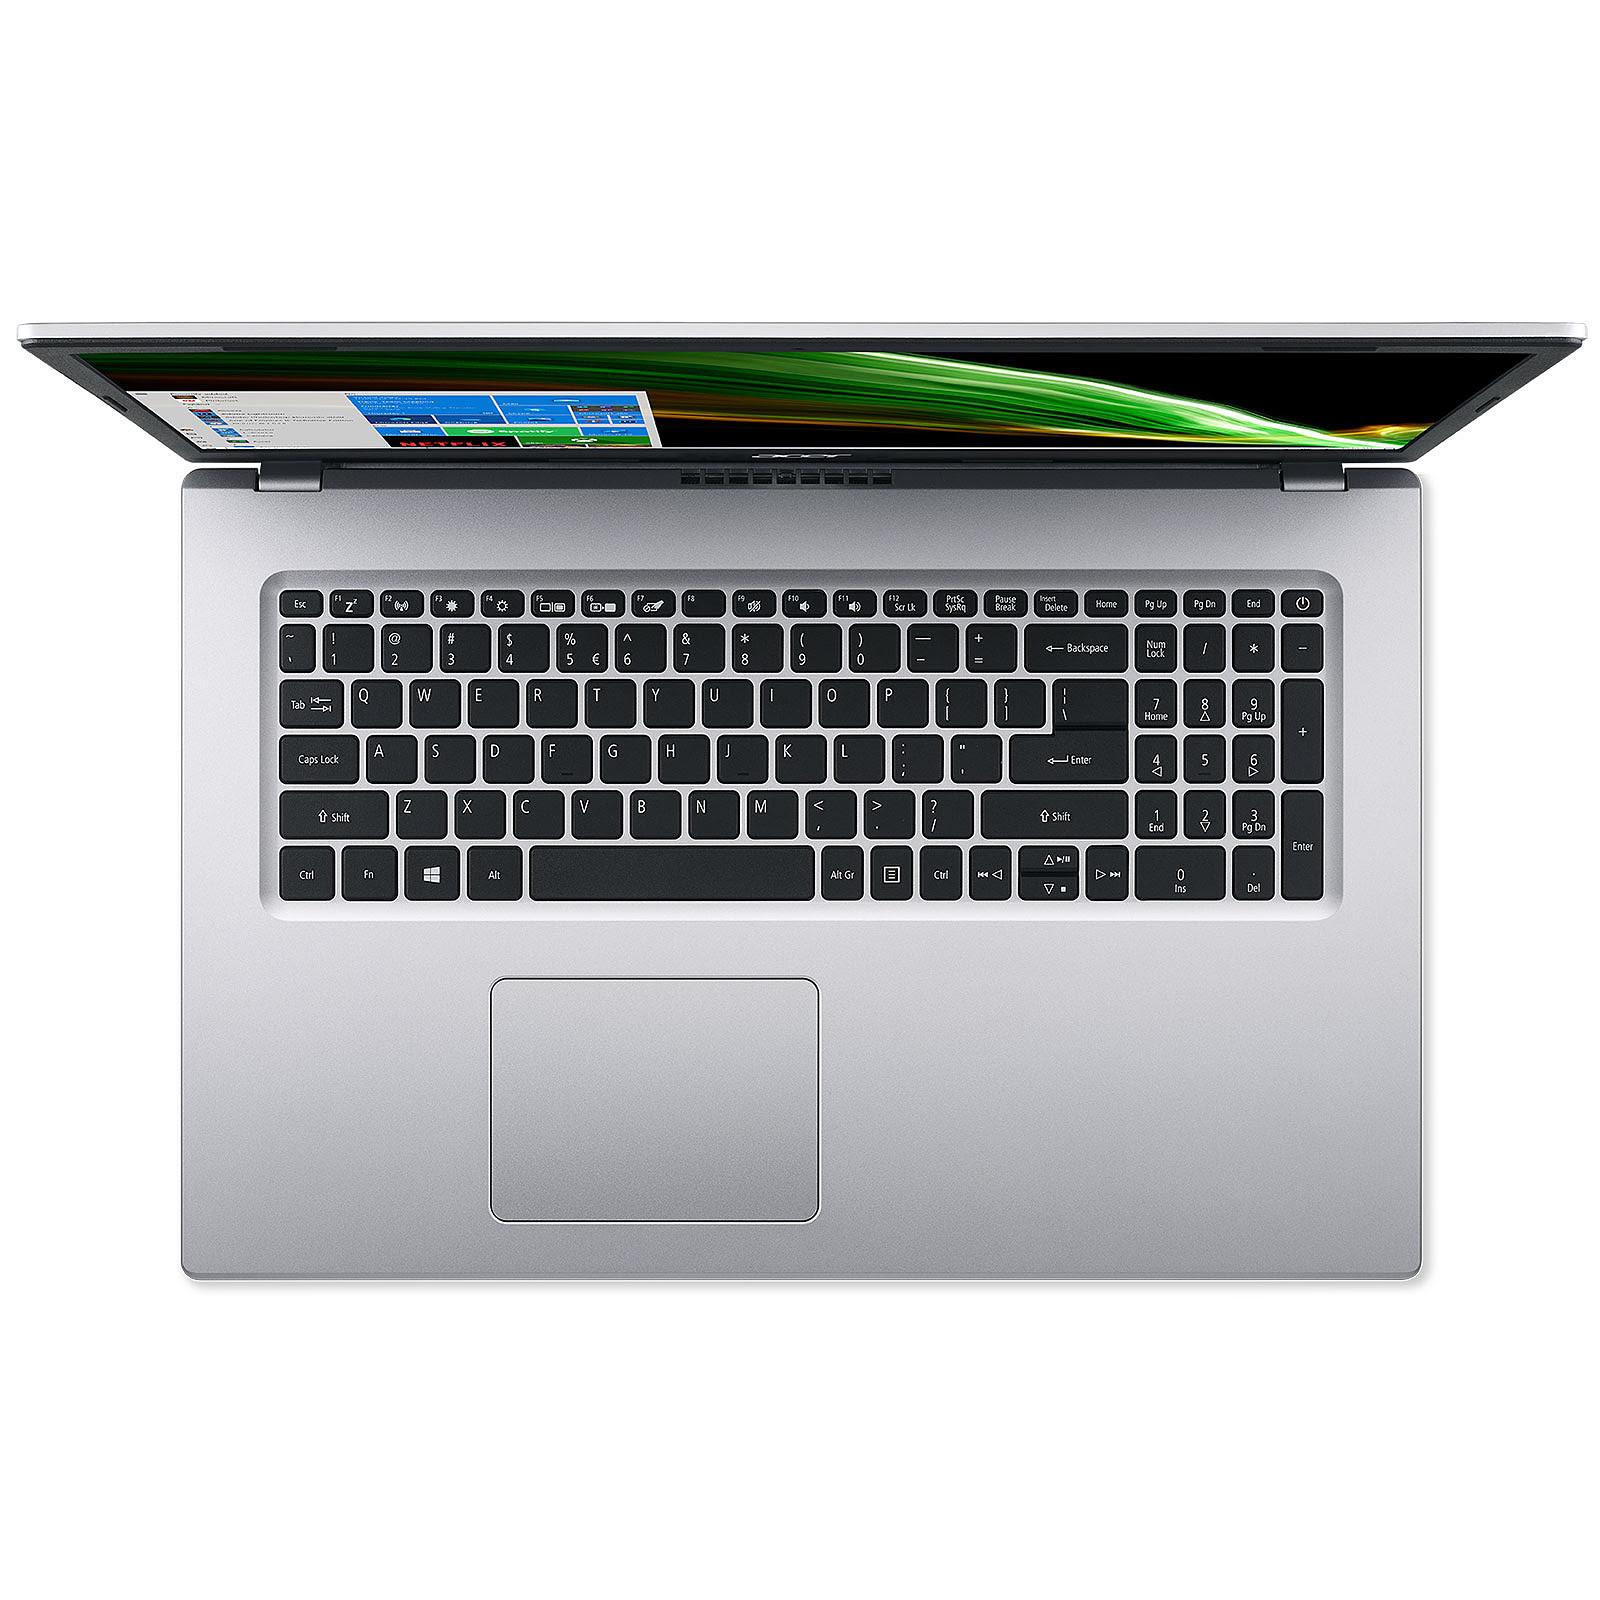 Acer NX.AD0EF.00G - PC portable Acer - Cybertek.fr - 3